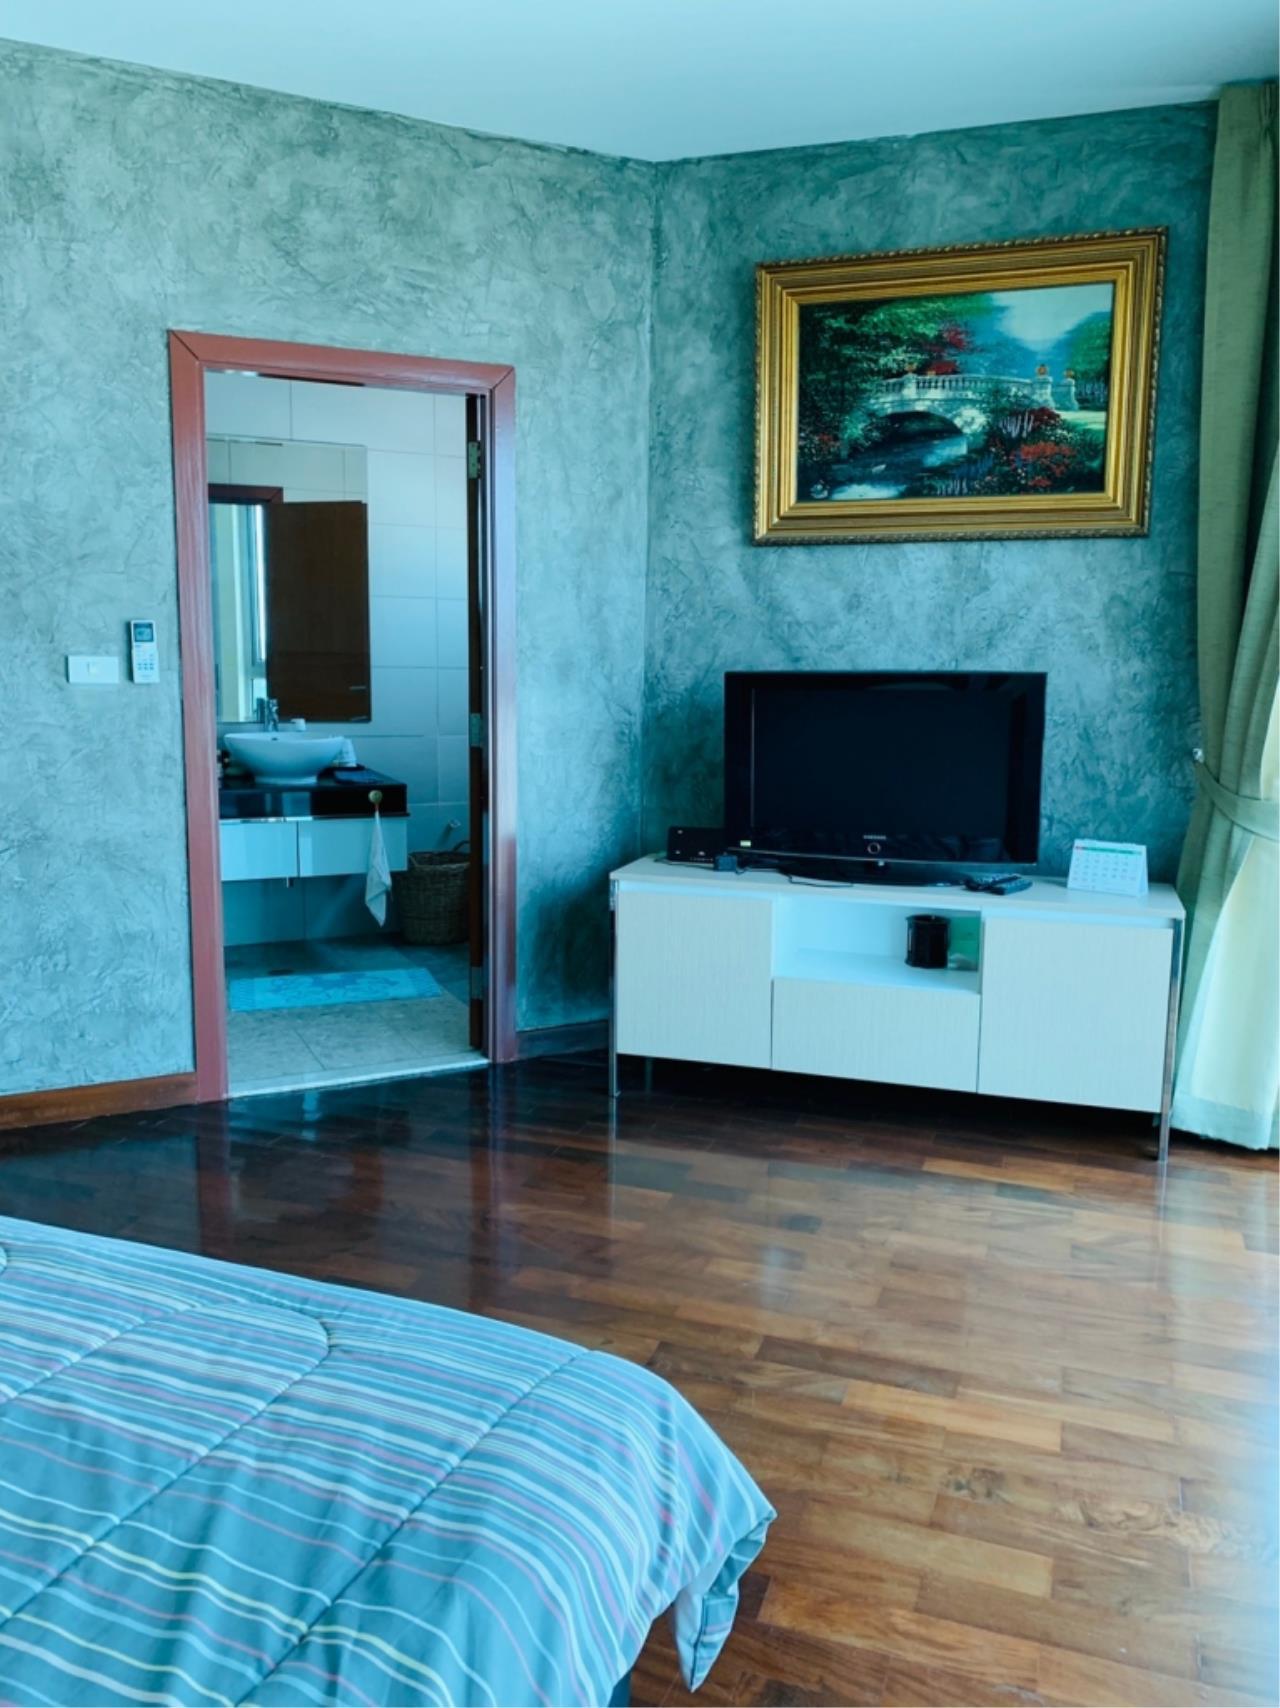 Century21 Skylux Agency's The Star Estate @ Narathiwas / Condo For Rent / 3 Bedroom / 165.09 SQM / BTS Chong Nonsi / Bangkok 3